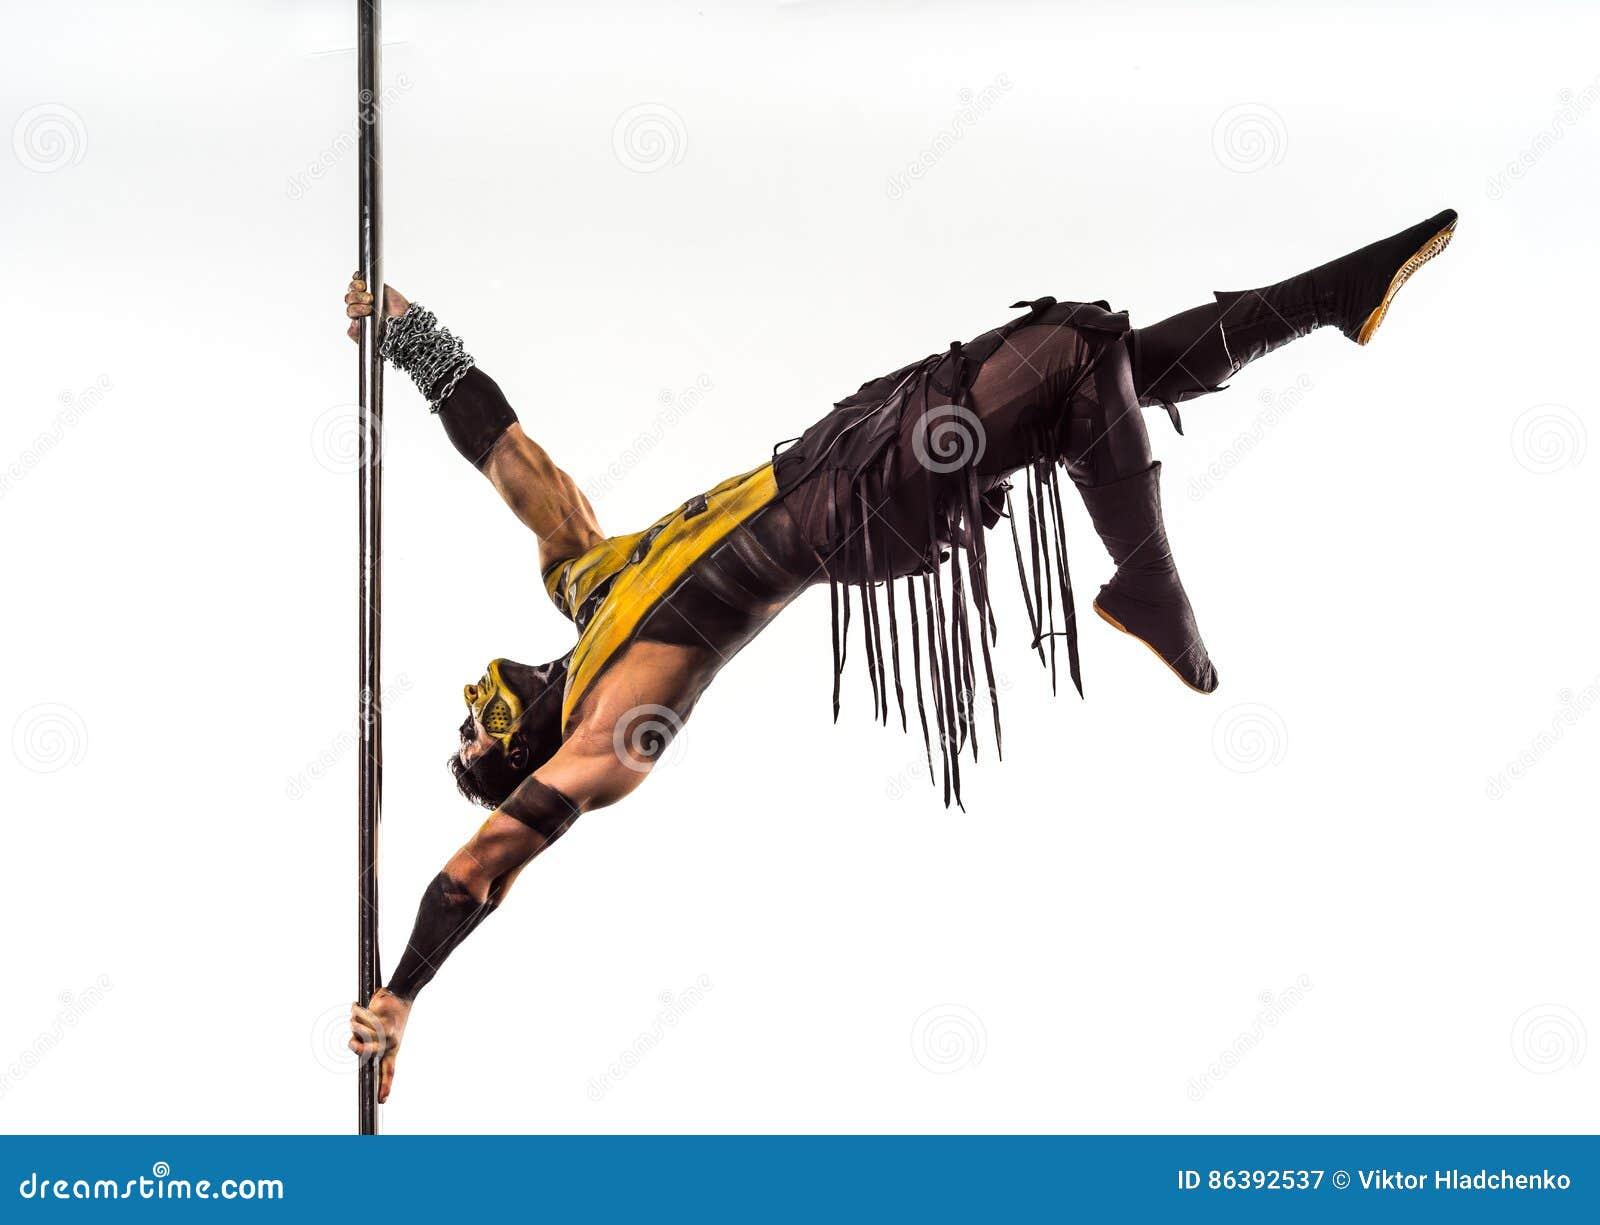 On The Pole Bodyart Scorpion Stock Image - Image of posing, body